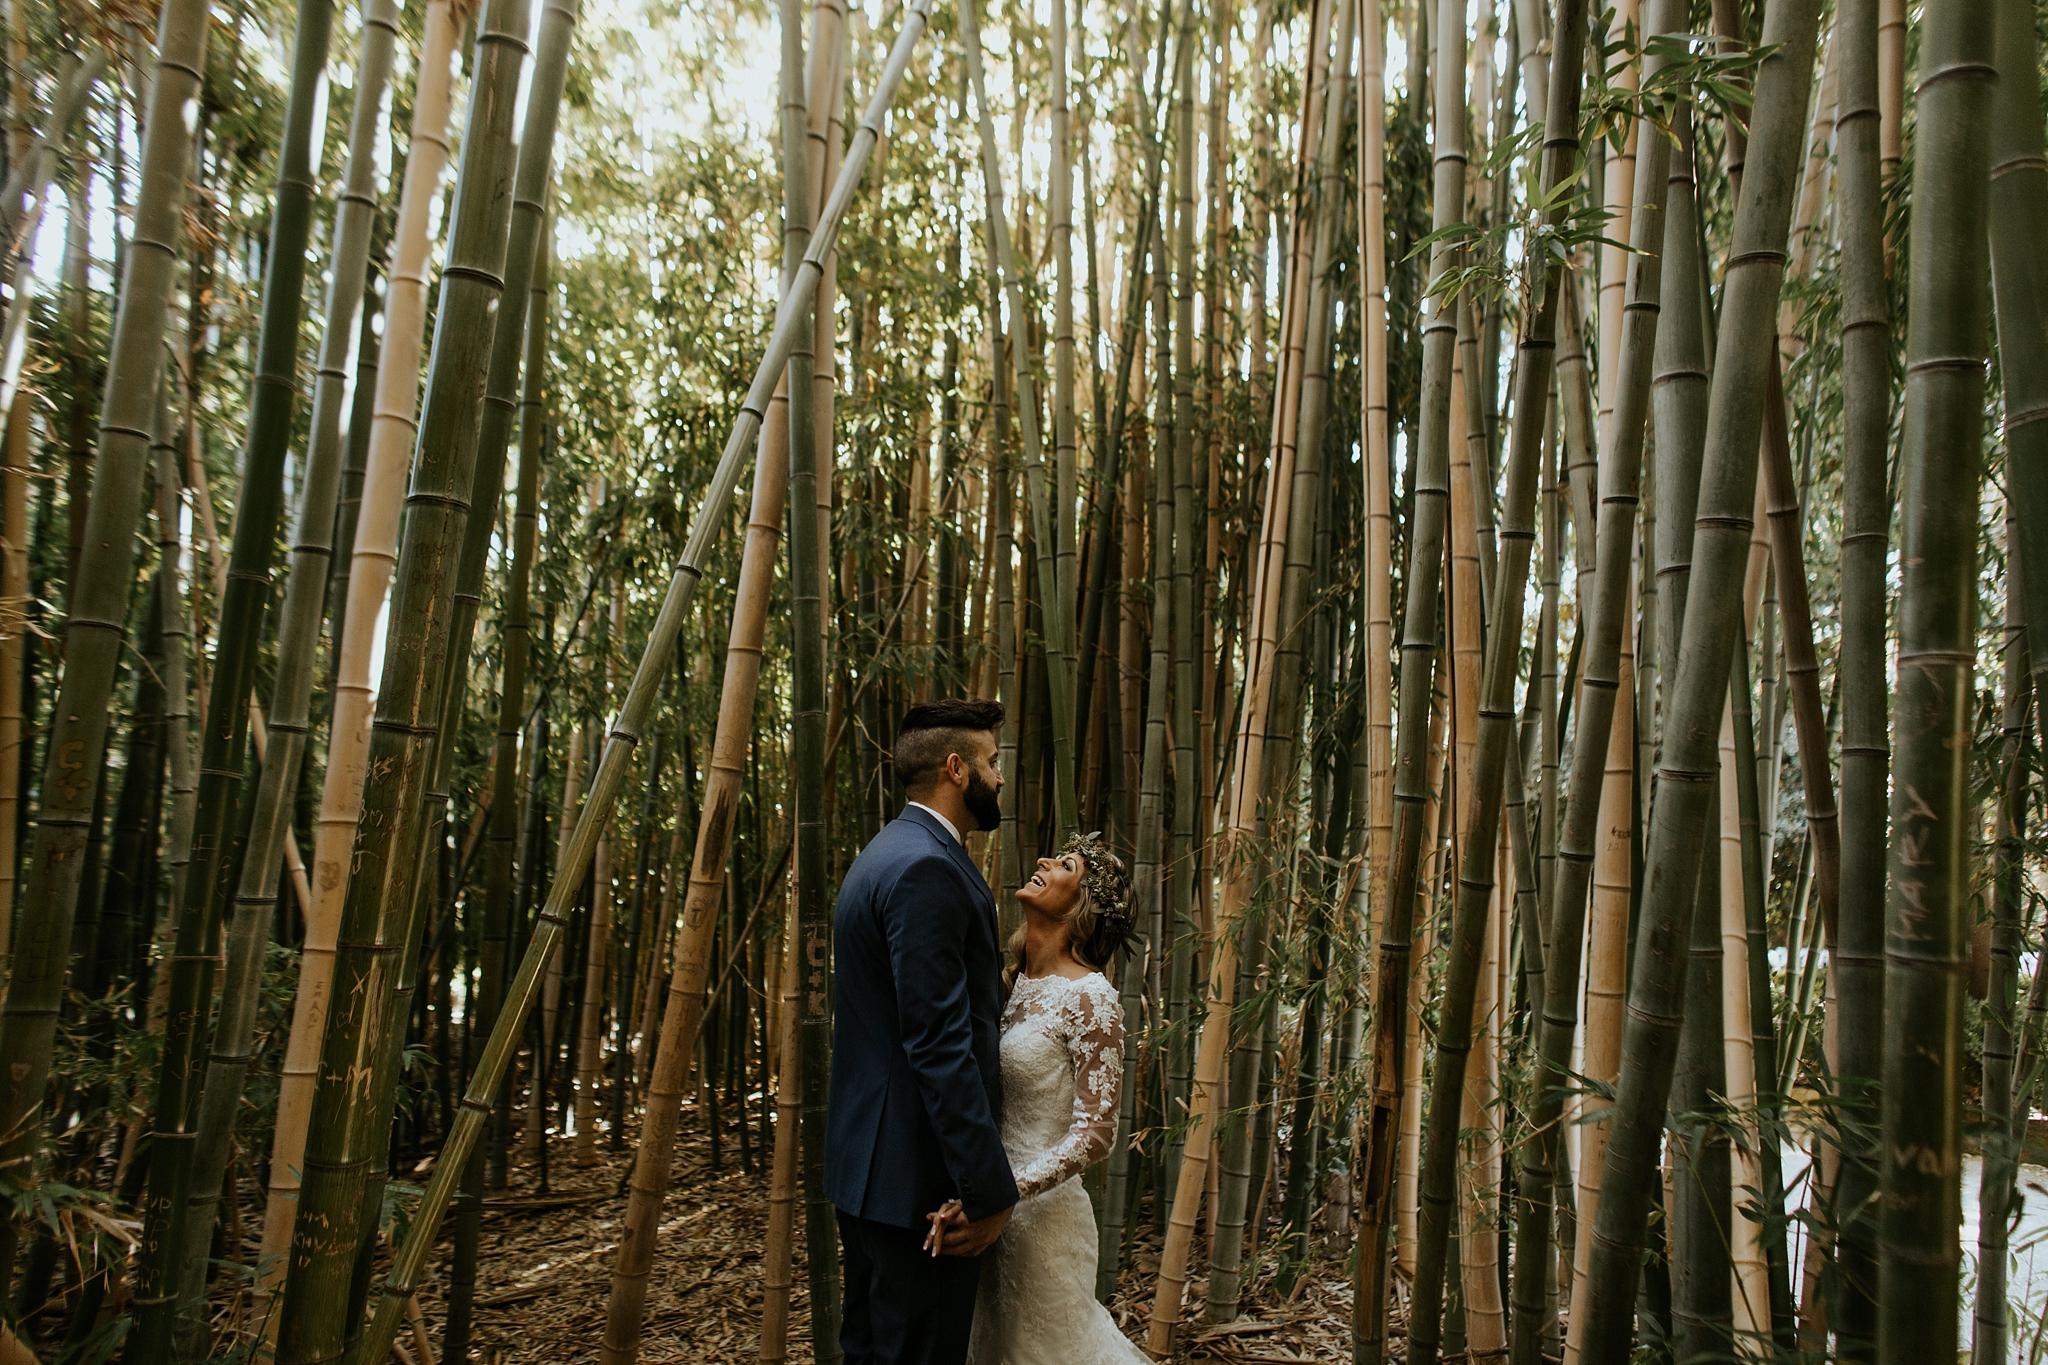 Bohemian Orcutt Ranch Wedding in Los Angeles California  - Los Angeles Californai Wedding Photographer_0014.jpg